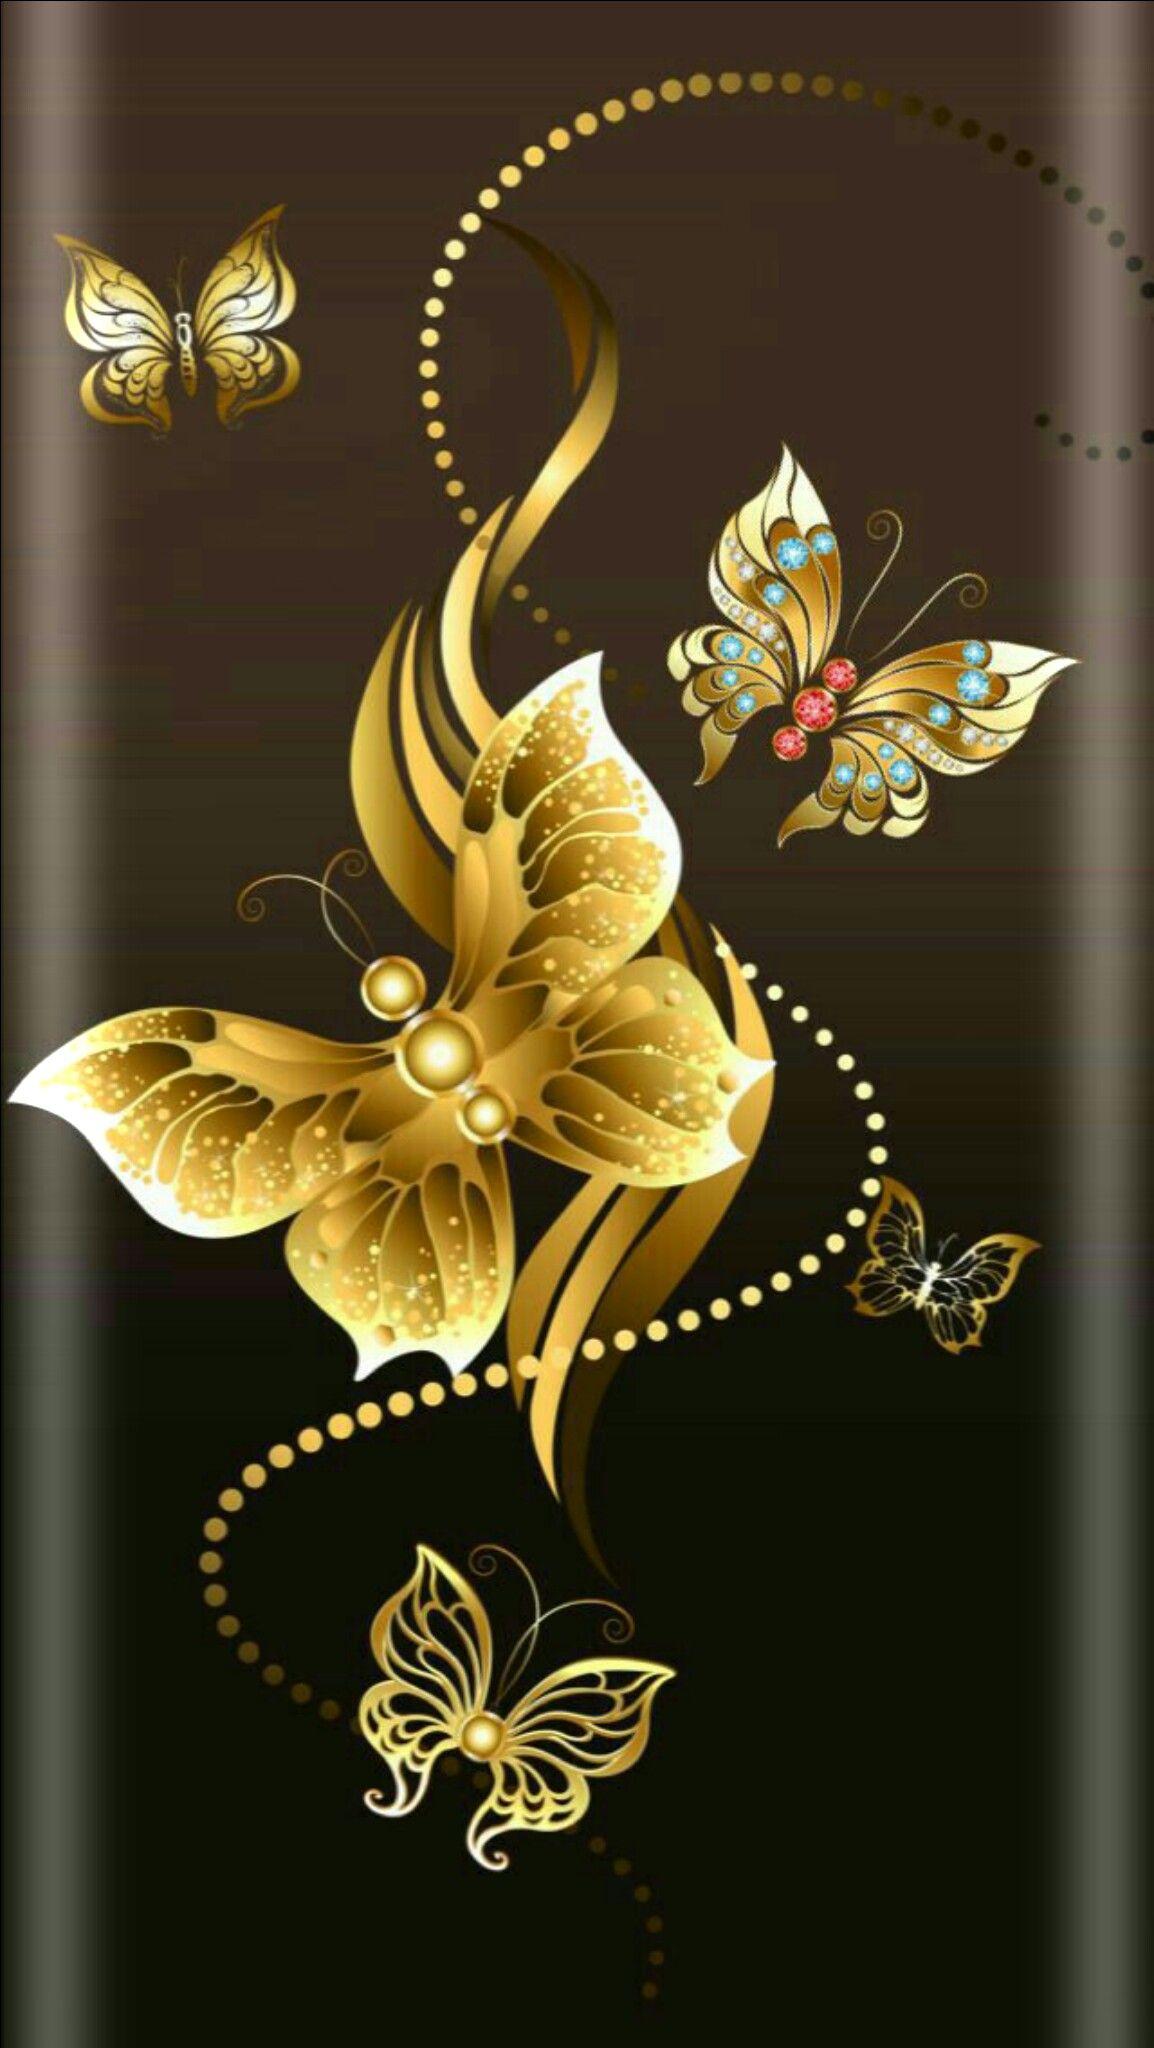 Pin by Sriram on ram   Pinterest   Butterfly, Wallpaper and ...